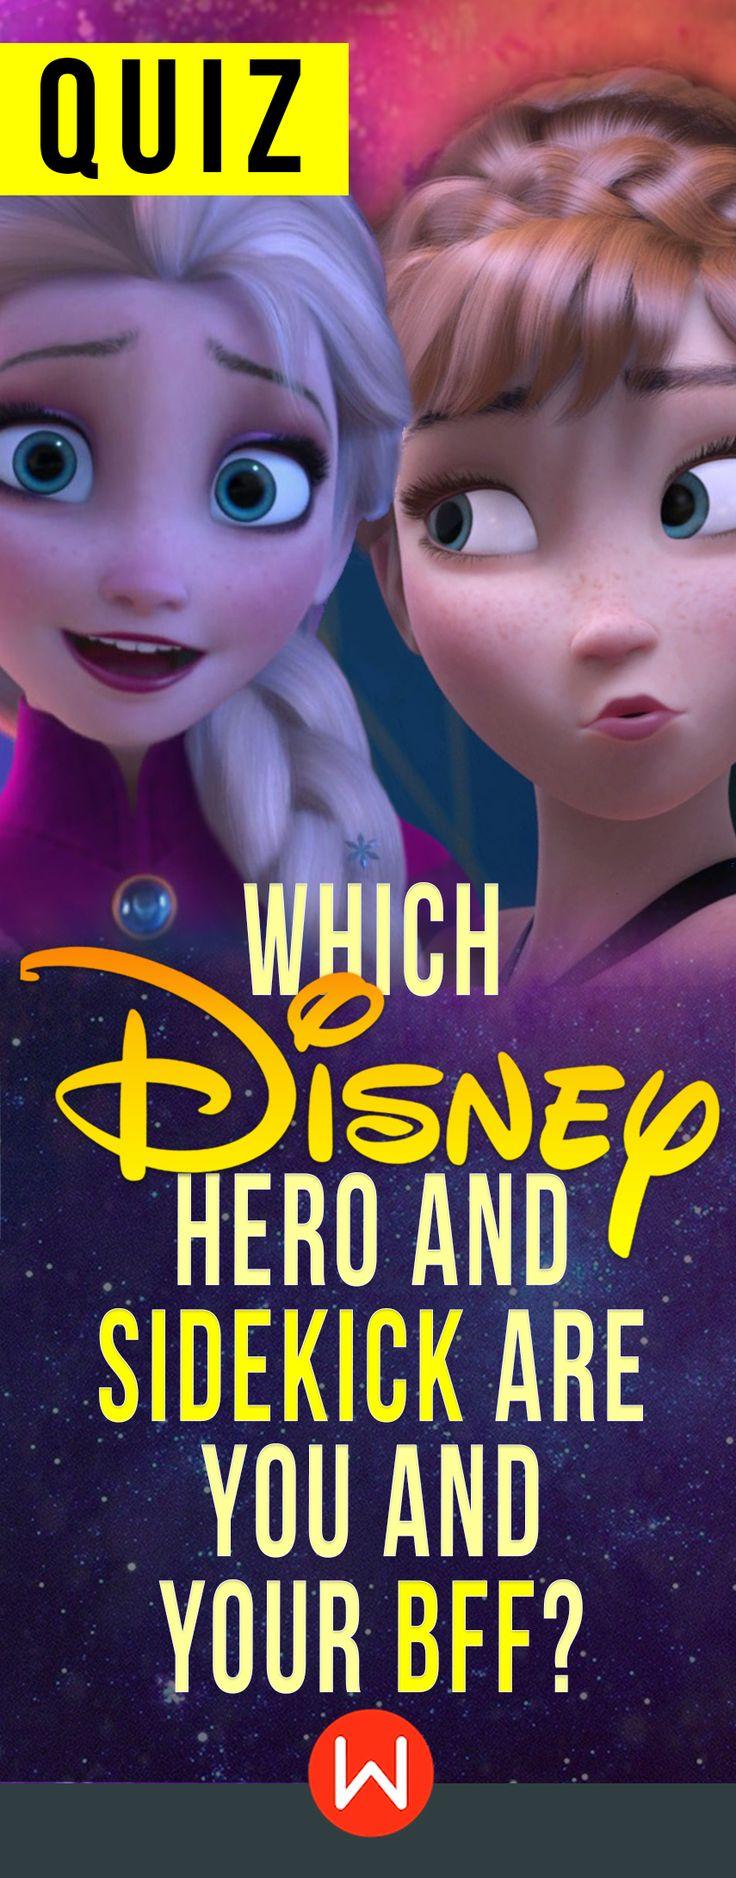 Disney Quiz: Which is your hero and sidekick are you and your BFF? Disney personality quiz. Disney test. Buzzfeed quizzes, playbuzz quiz, Disney BFF quiz.